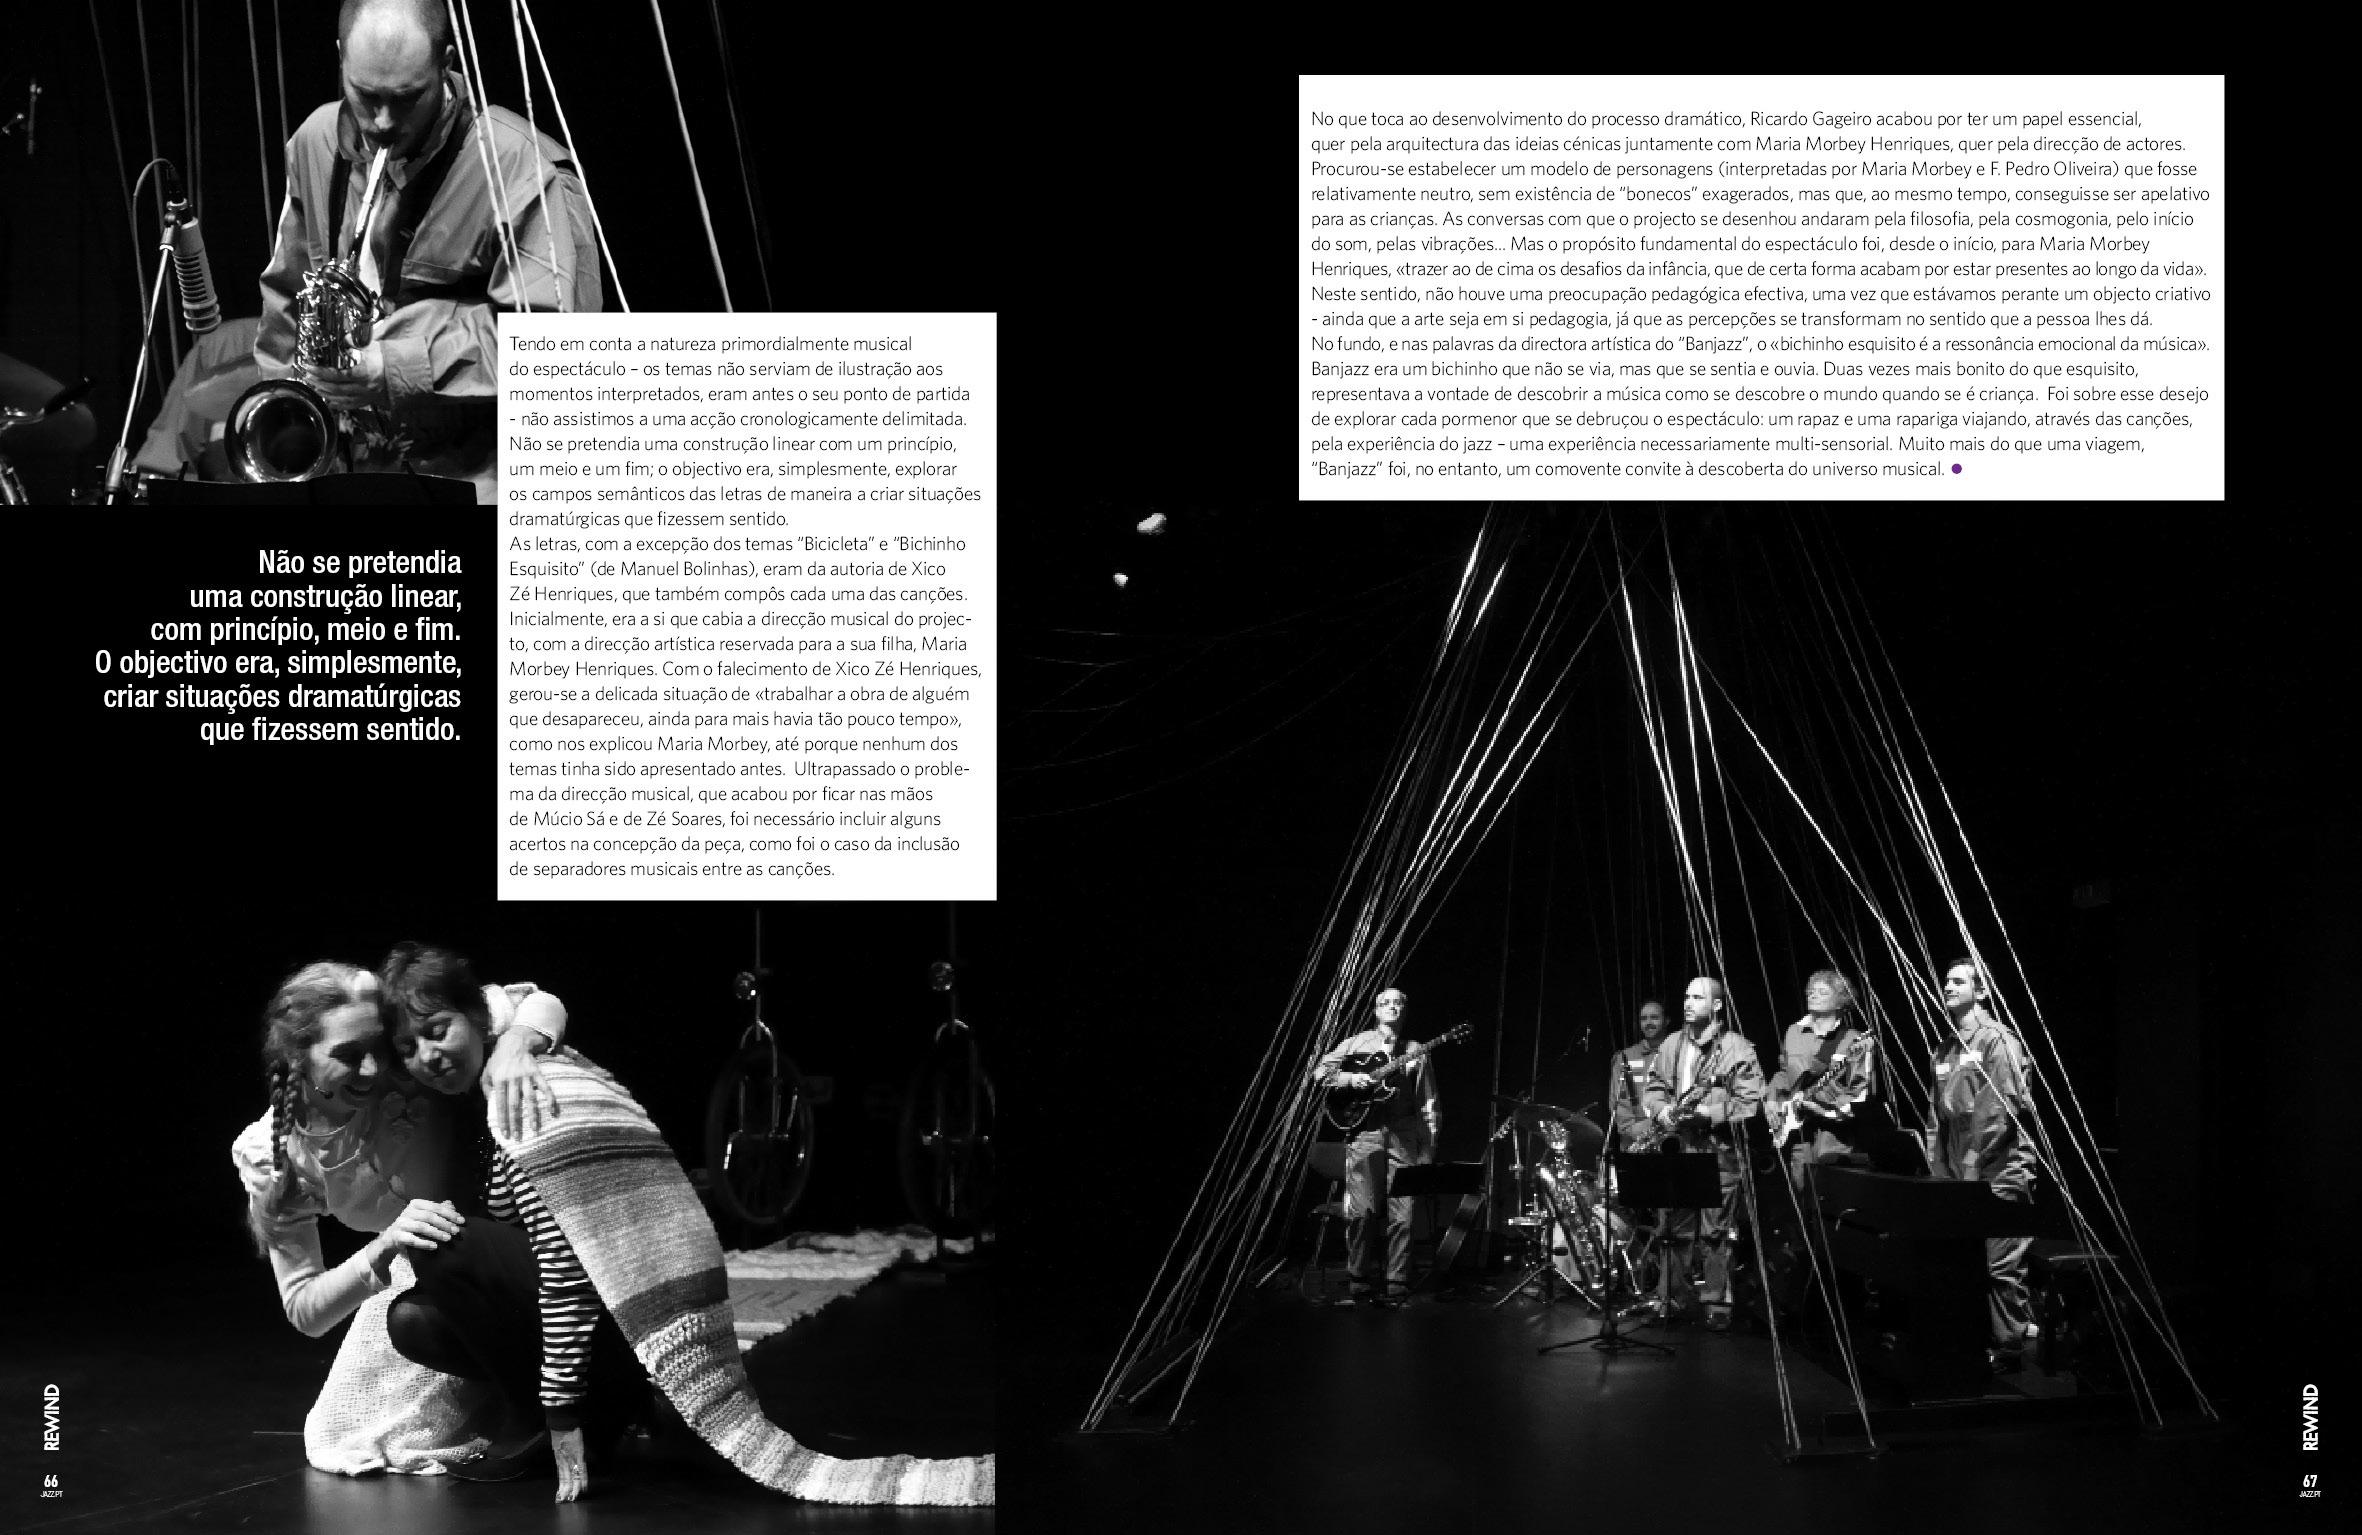 "<span  class=""uc_style_uc_tiles_grid_image_elementor_uc_items_attribute_title"" style=""color:#ffffff;"">Ana Paula Rocha - Teatro - Banjazz - um bichinho esquisito - Fevereiro 2010 - 002</span>"